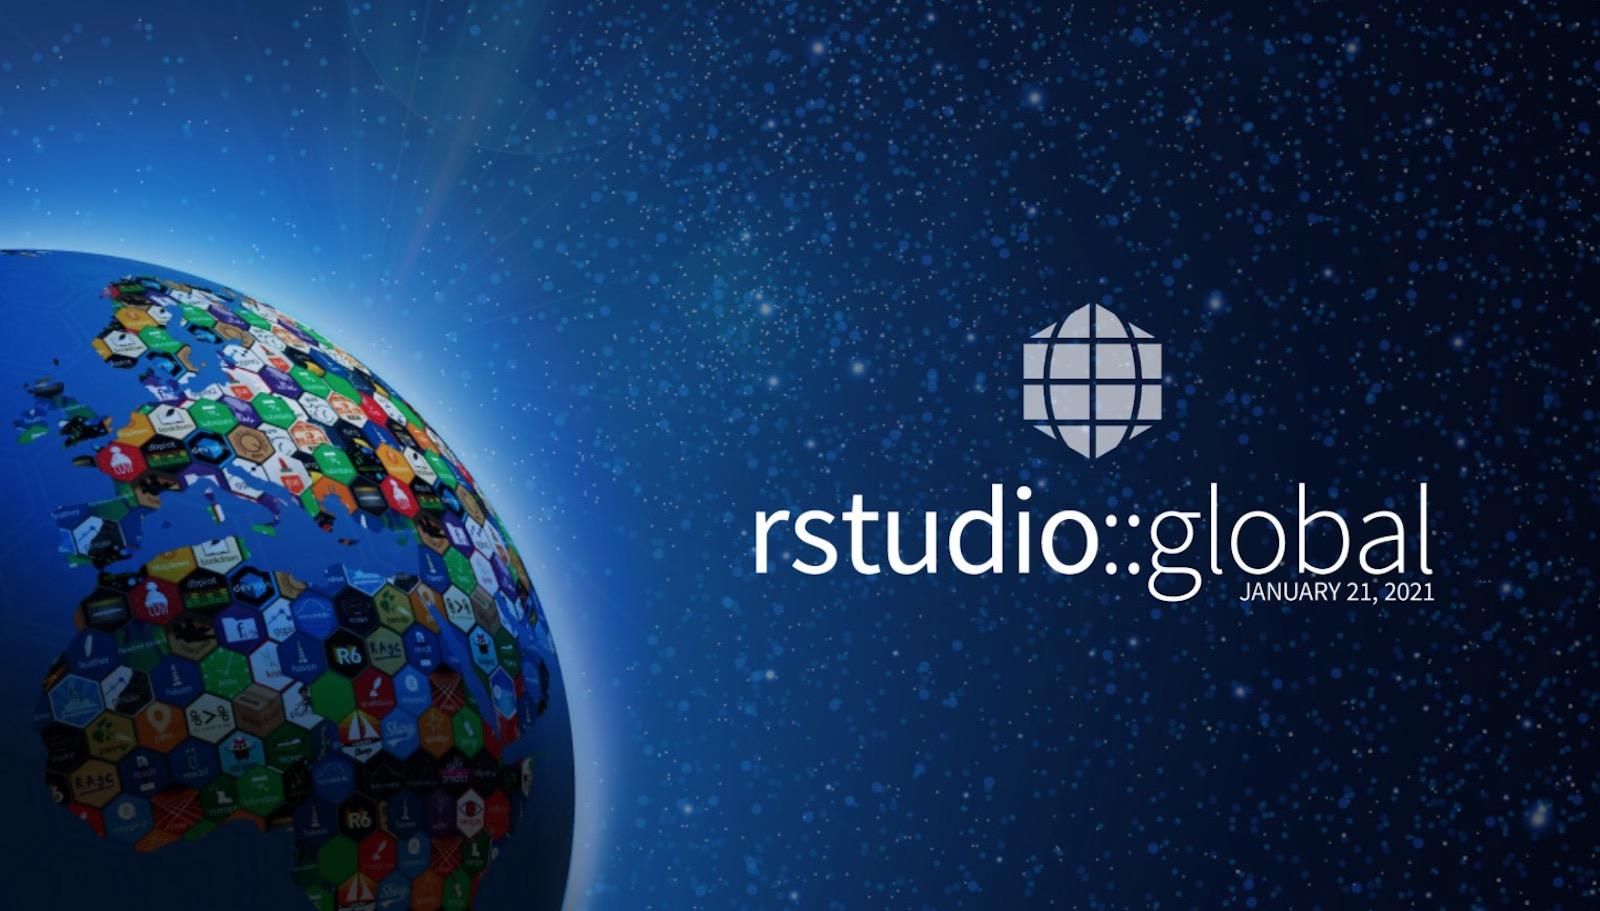 rstudio::global(2021) logo